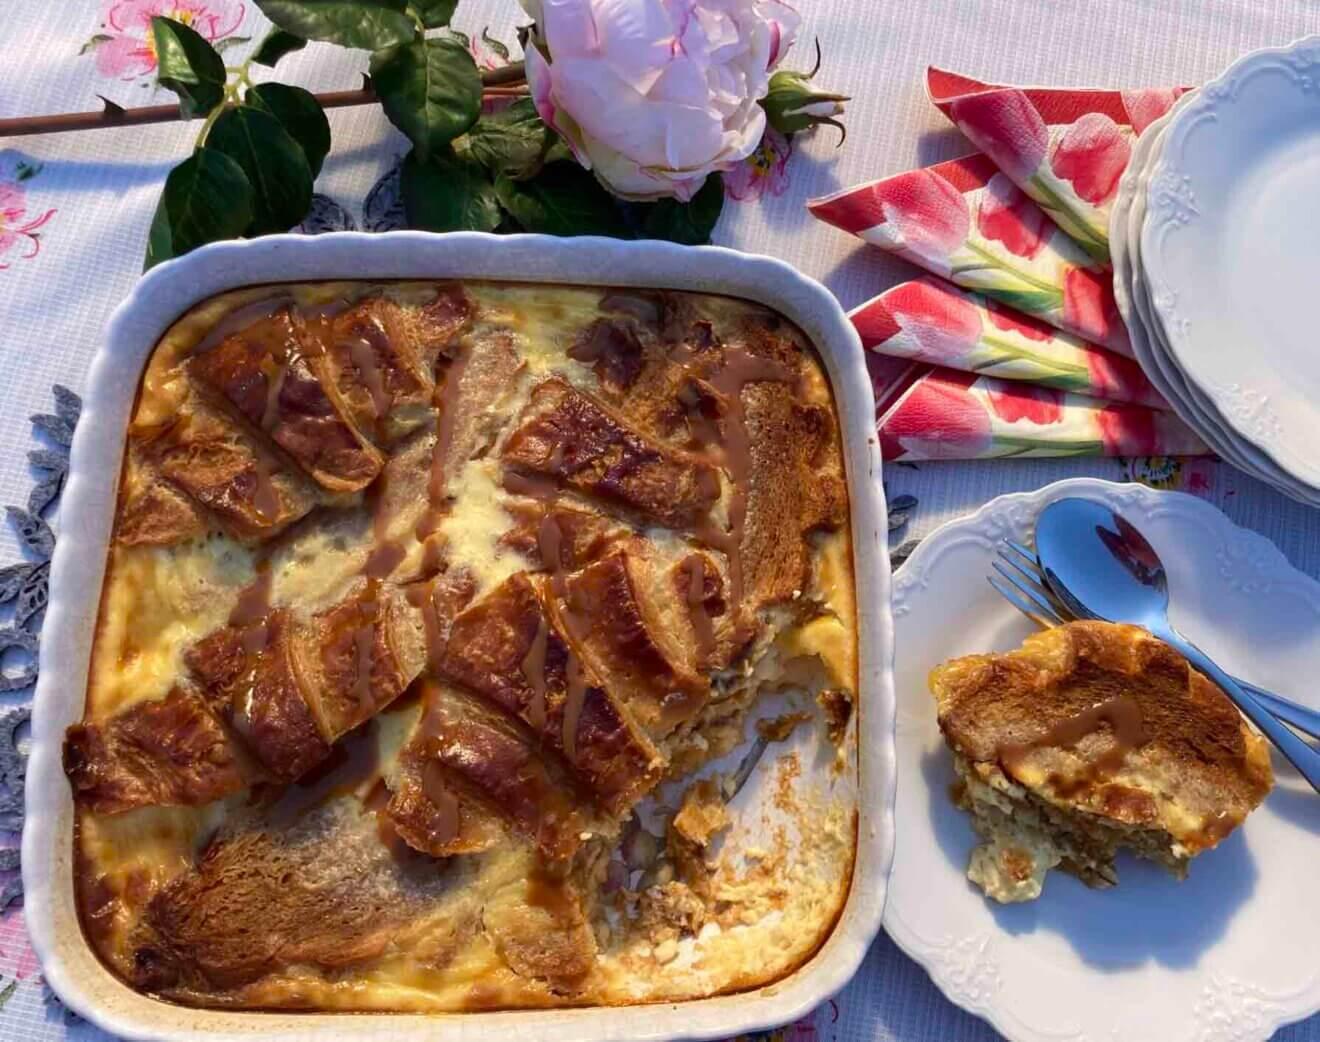 Caramel-croissant-pudding-6-2048x1536